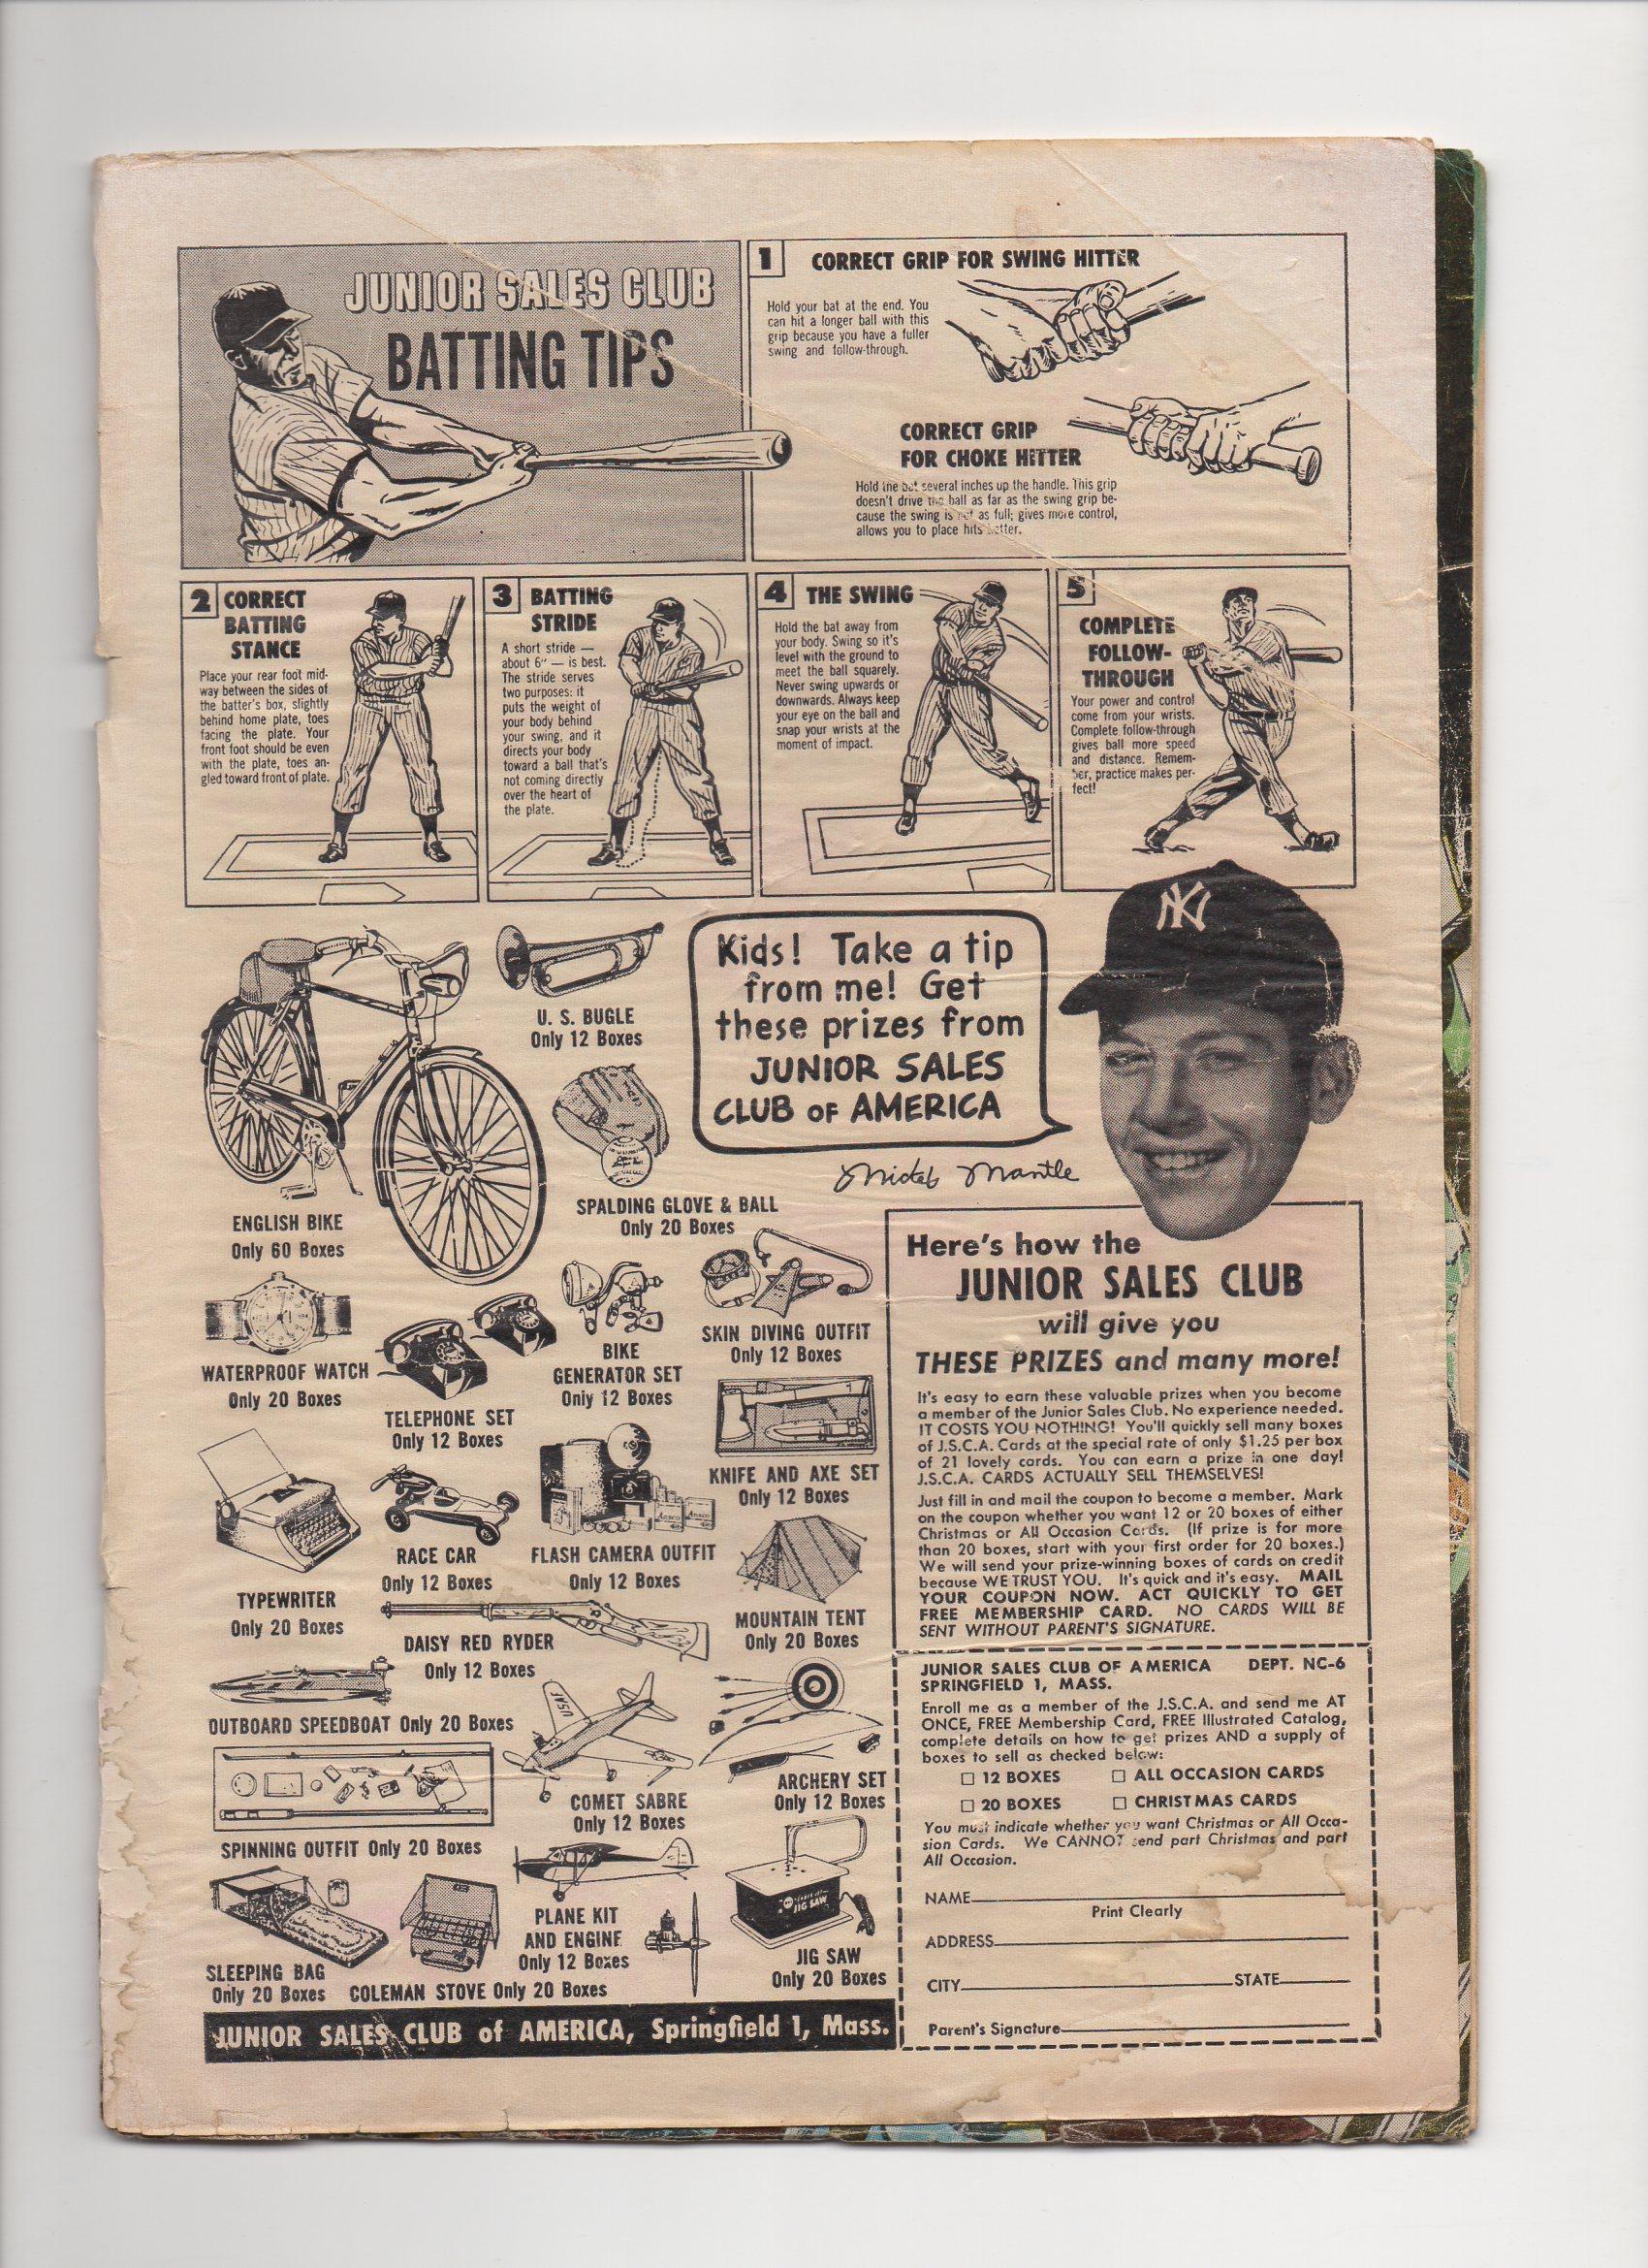 1957 comic book ad, national comics